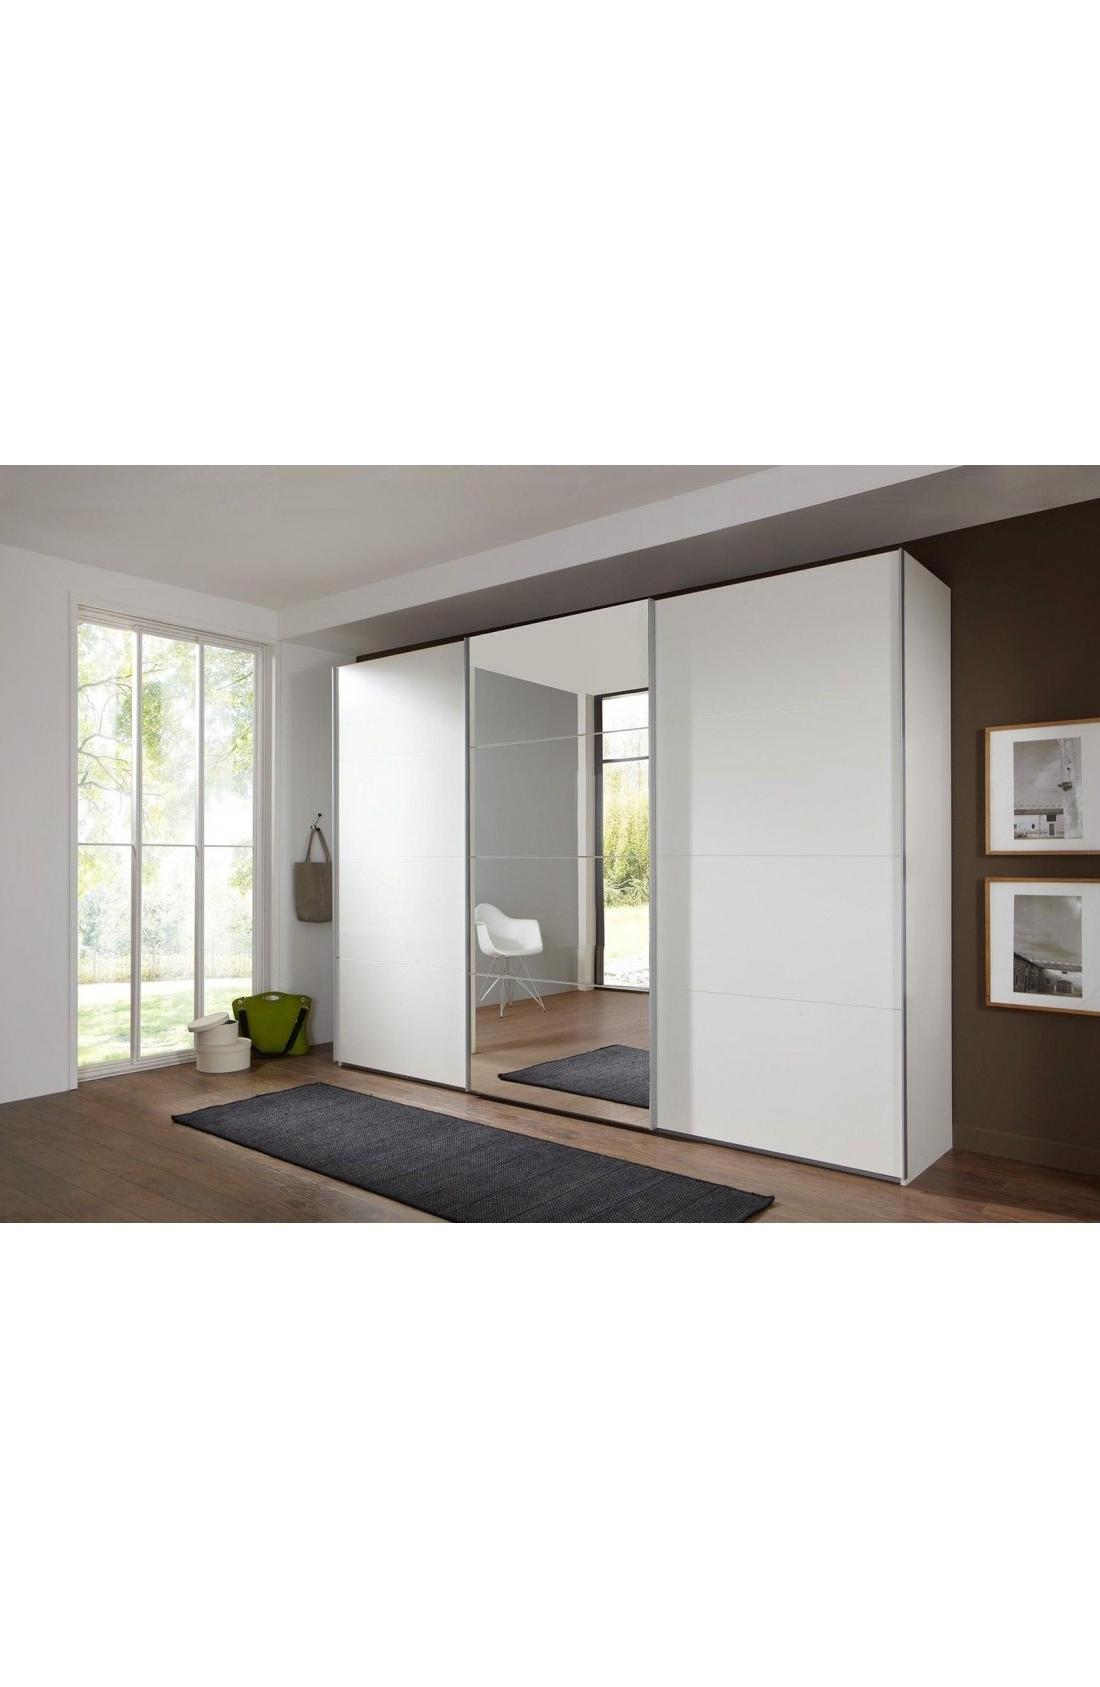 Fashionable White 3 Door Wardrobes With Mirror With Regard To Slumberhaus 'ernie' German Made Modern 270cm White & Mirror 3 Door (View 15 of 15)